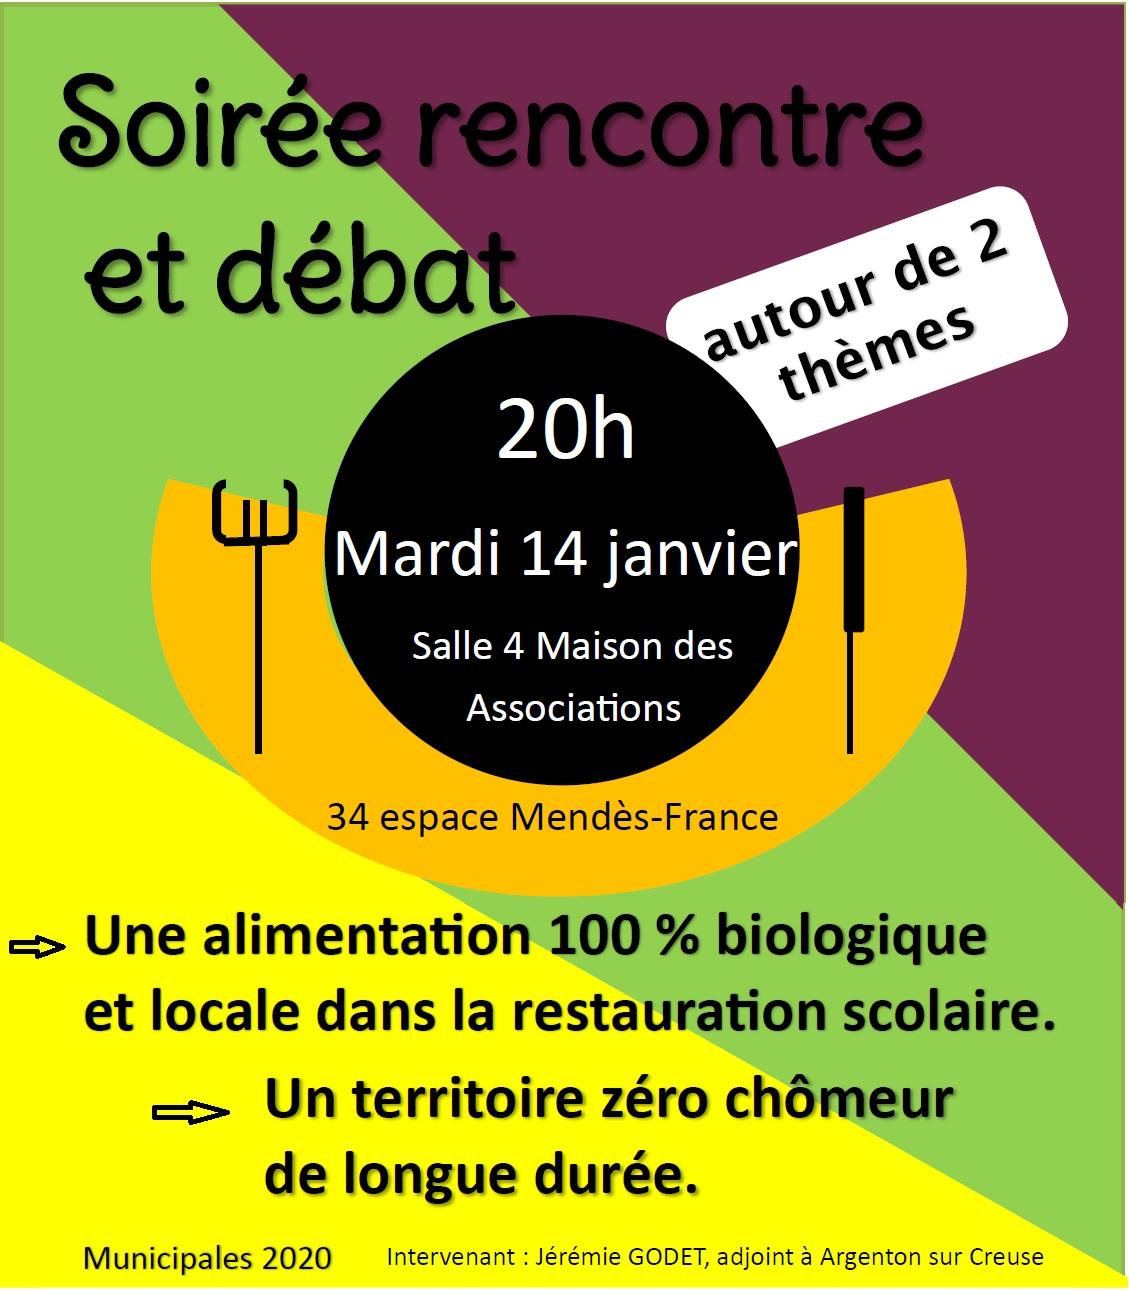 chateauroux demain; Chateauroux DEMAIN